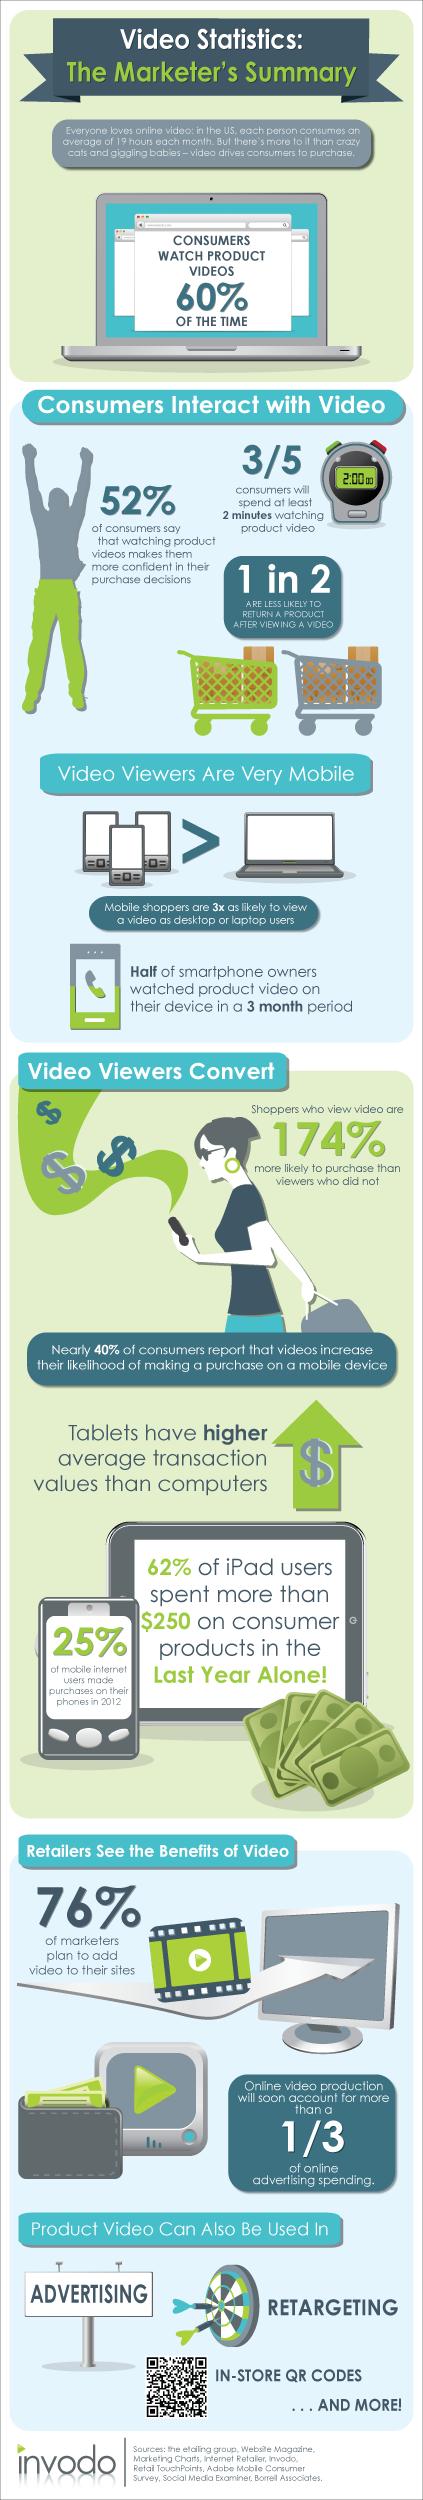 Video Statistics - The Marketer's Summary